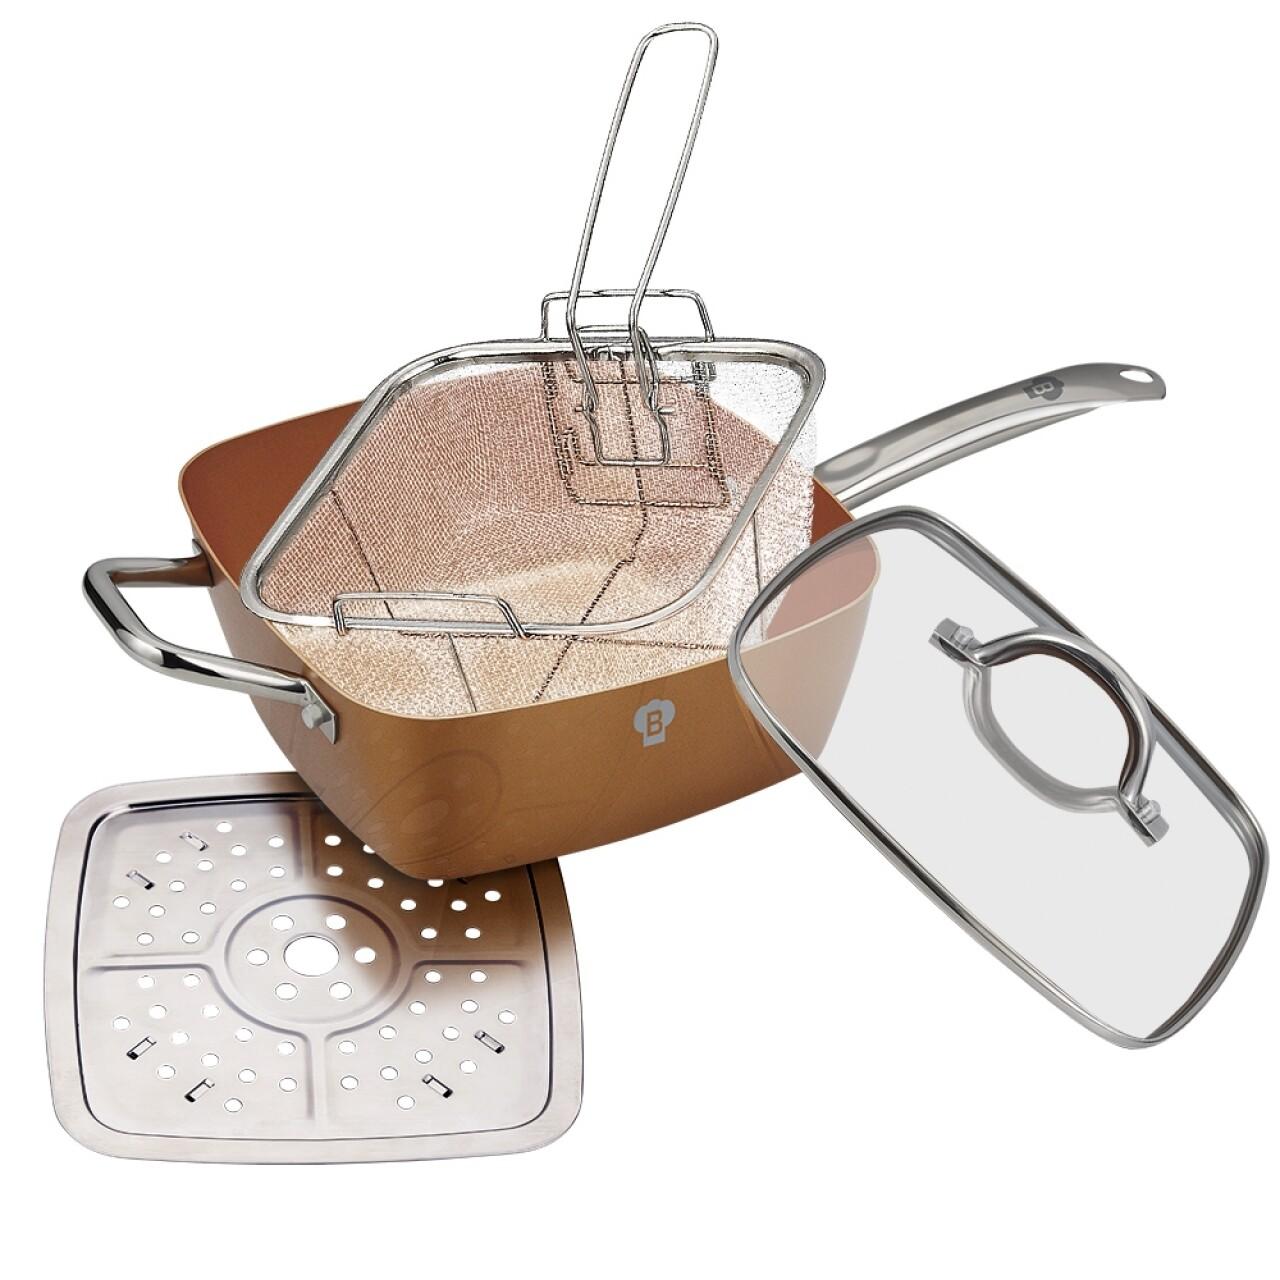 Tigaie patrata multifunctionala cu capac, Blaumann, Chef, 24x24 cm